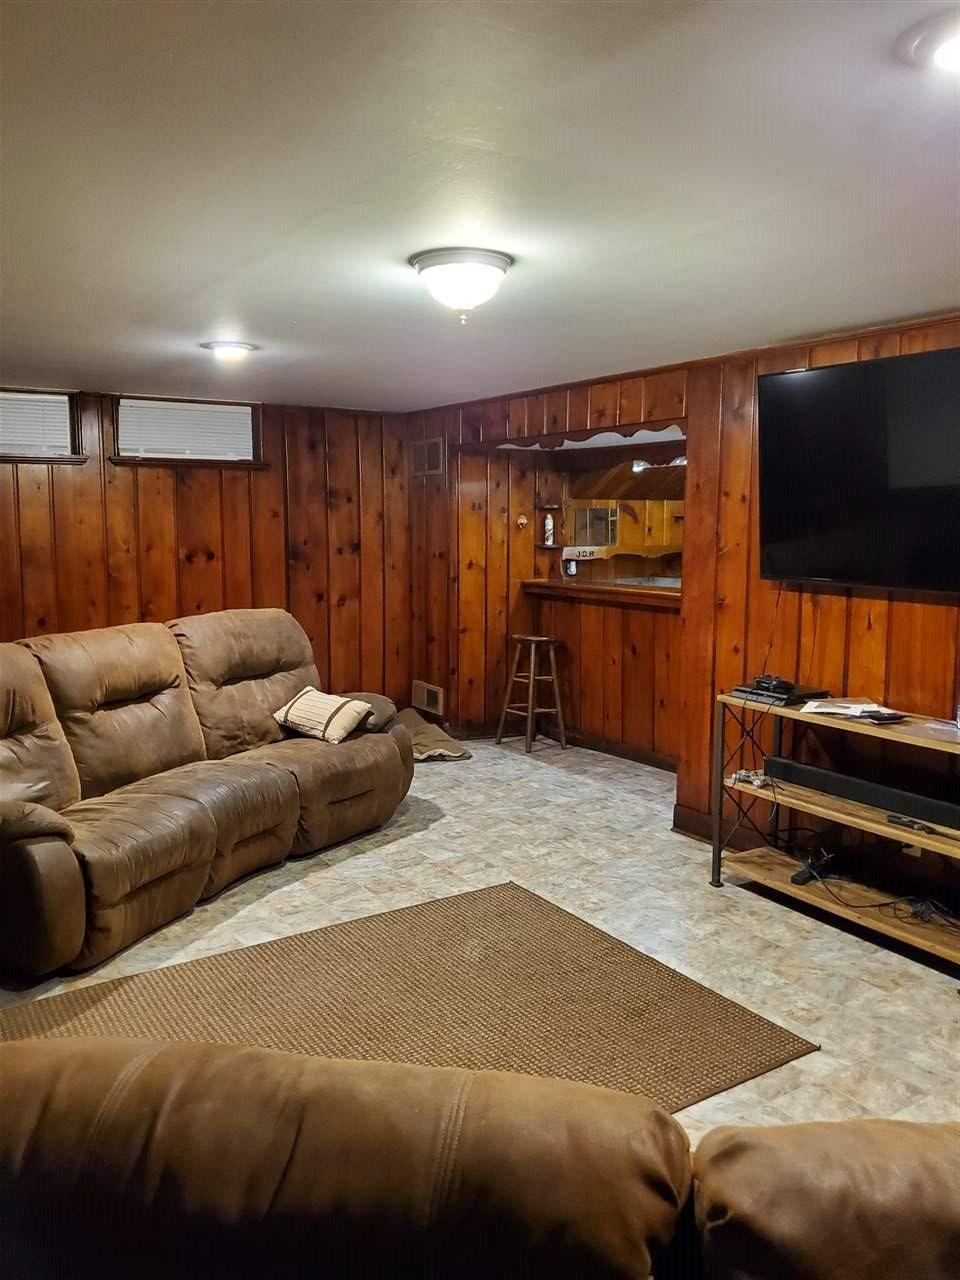 #century21groupone,#homesforsaleponcacity,#poncacityrealestate | 1106 S 7th Street  Ponca City, OK 74601-0 35